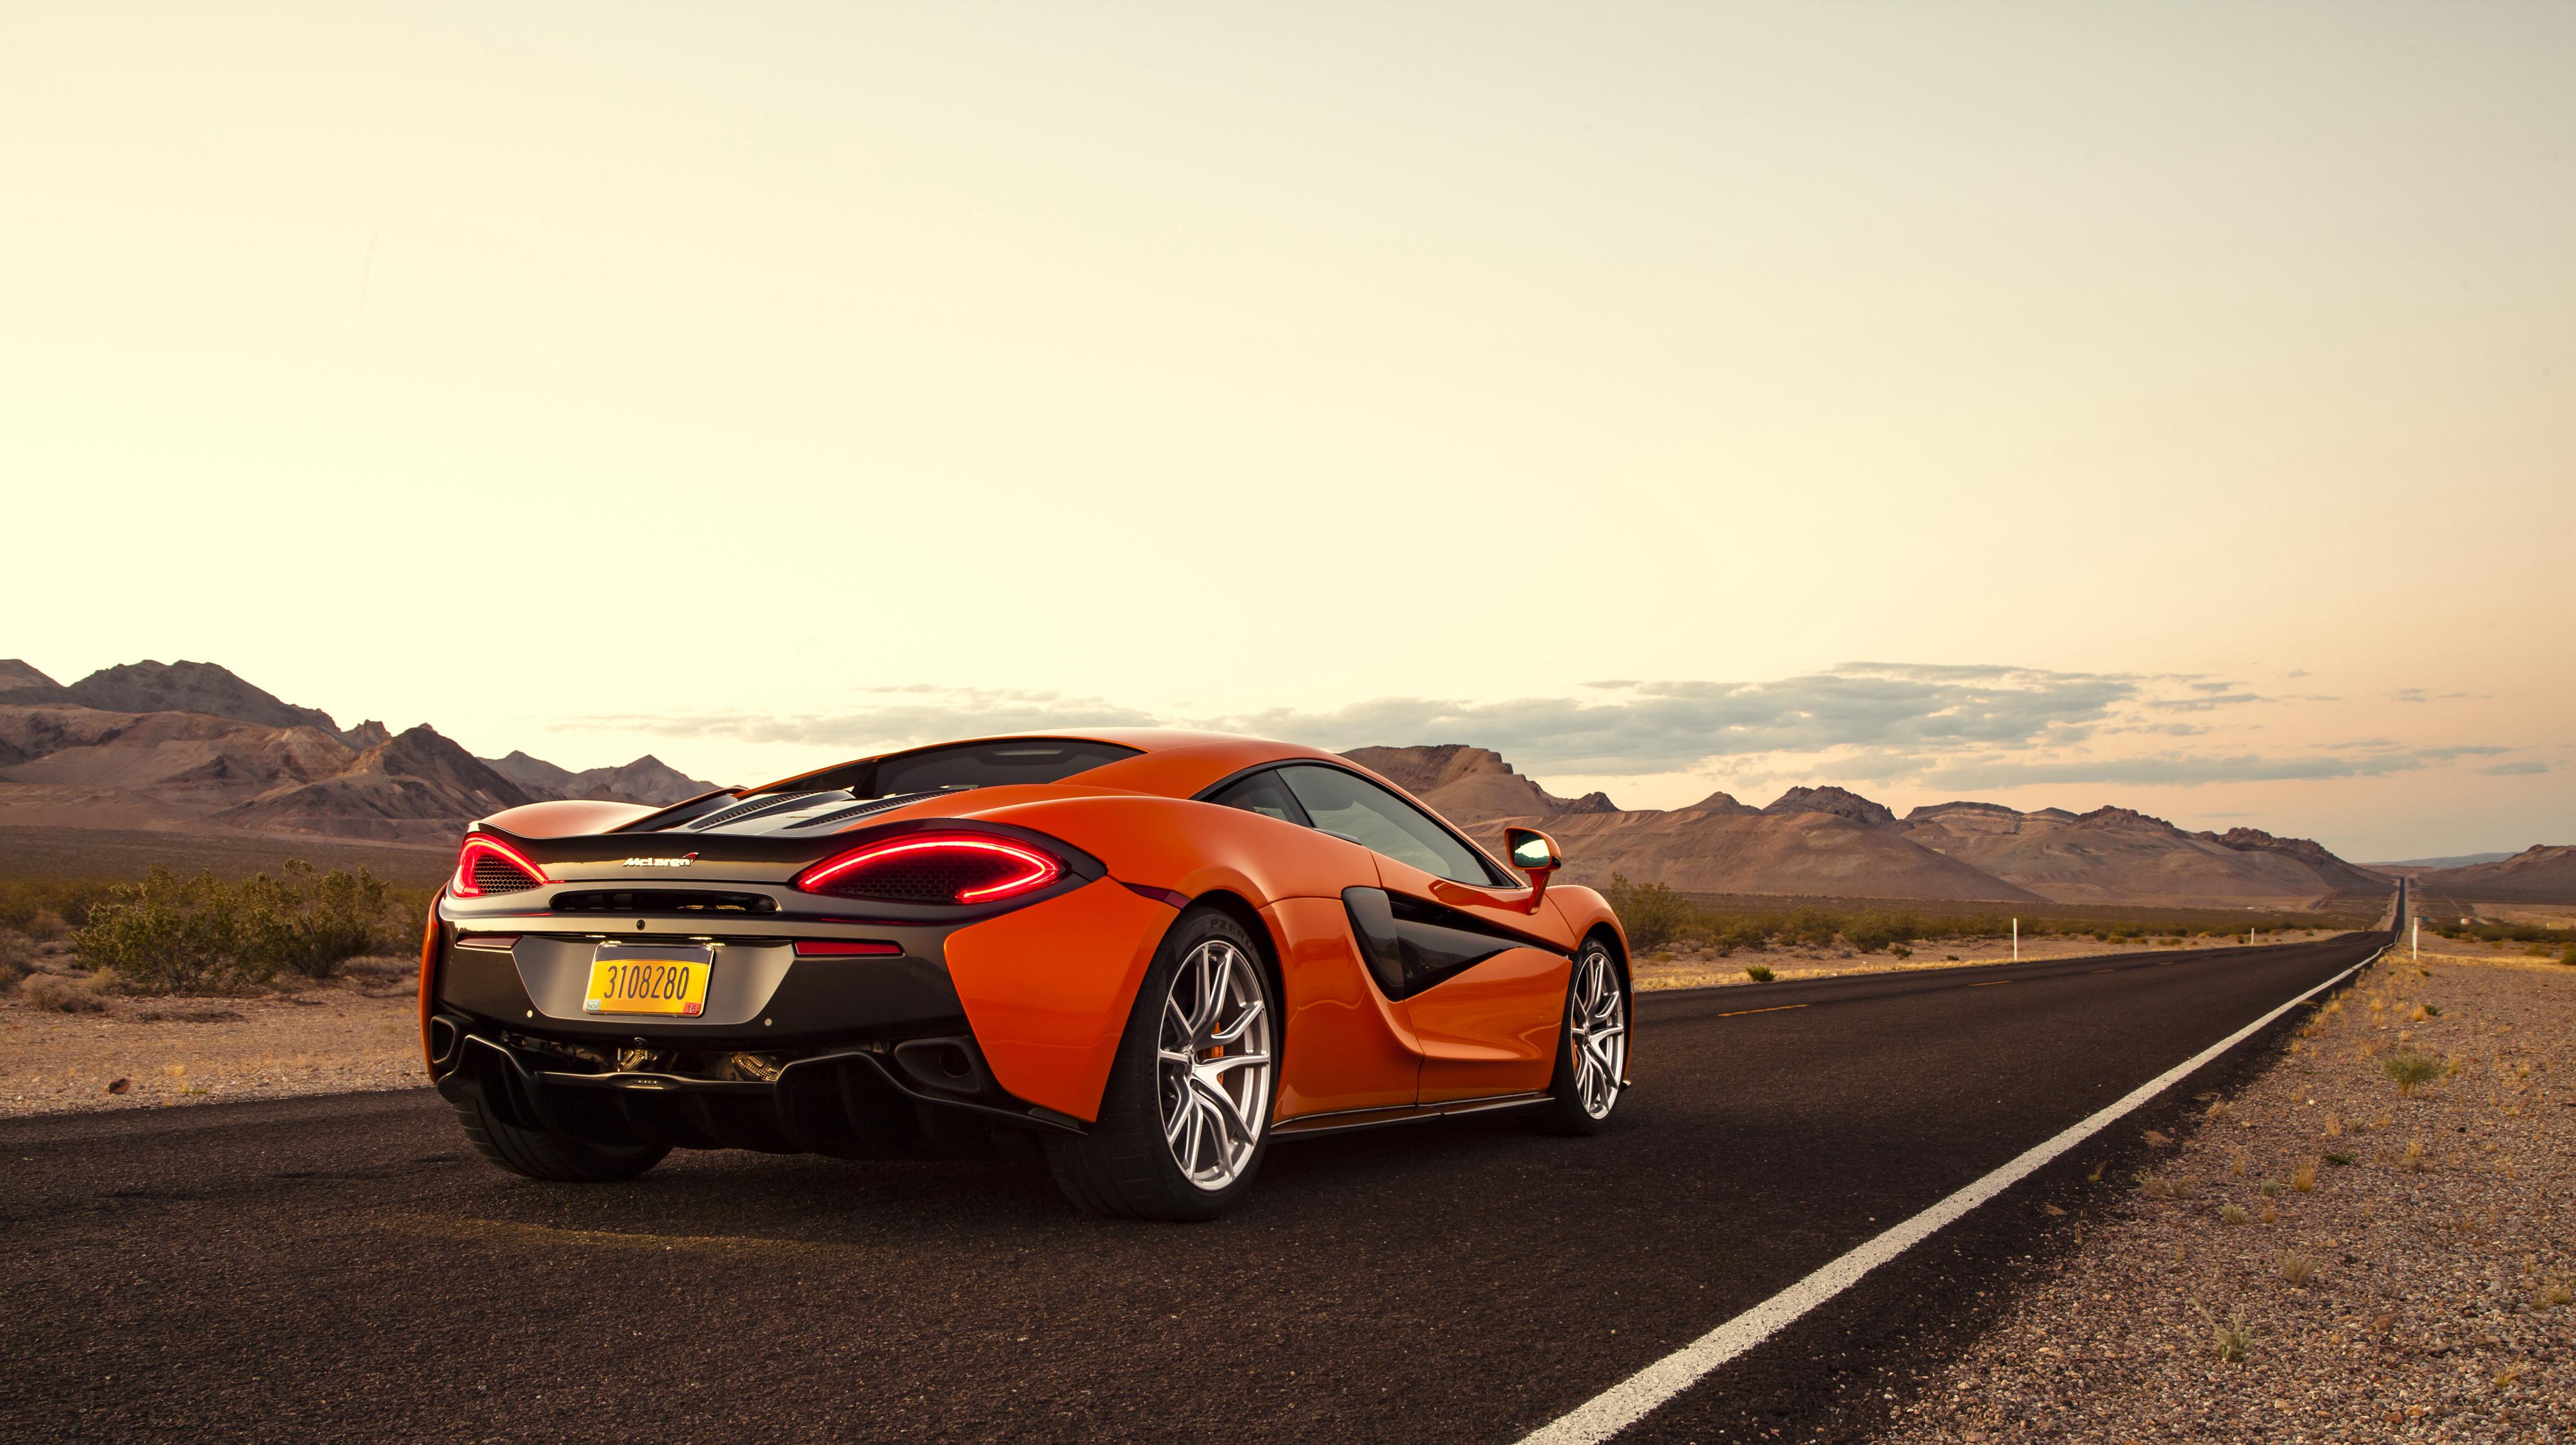 2020 McLaren 570S Coupe Exterior